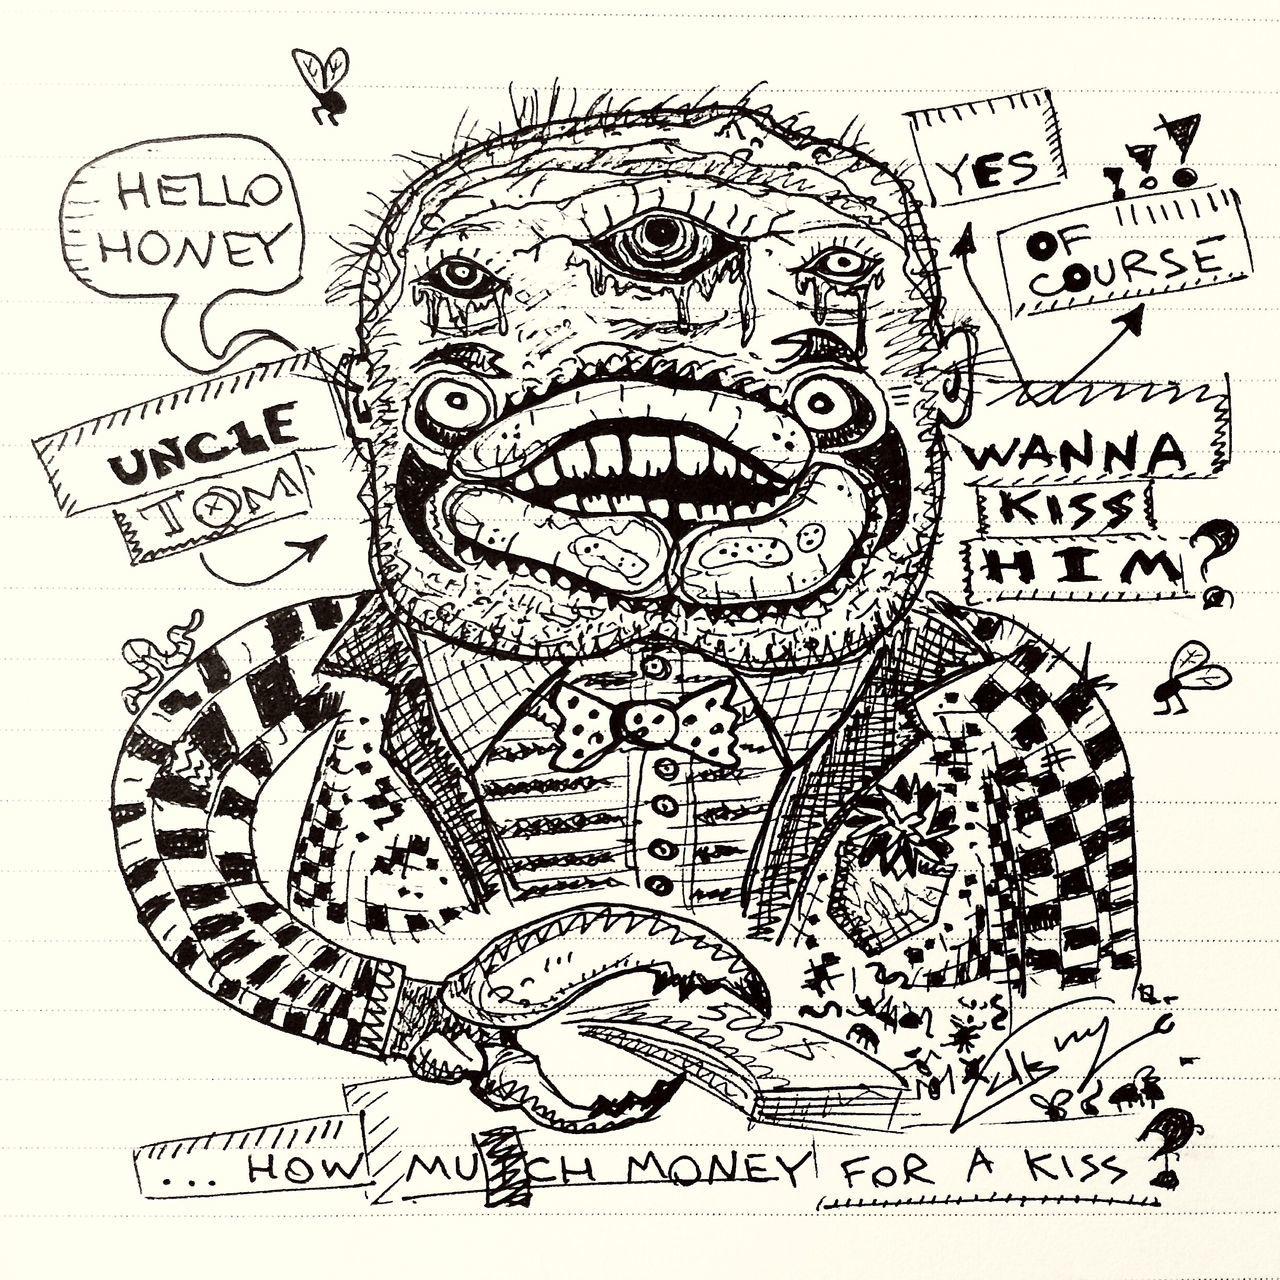 doodle, sketch, paper, pencil drawing, human face, fine art portrait, music, the media, adult, human body part, internet, people